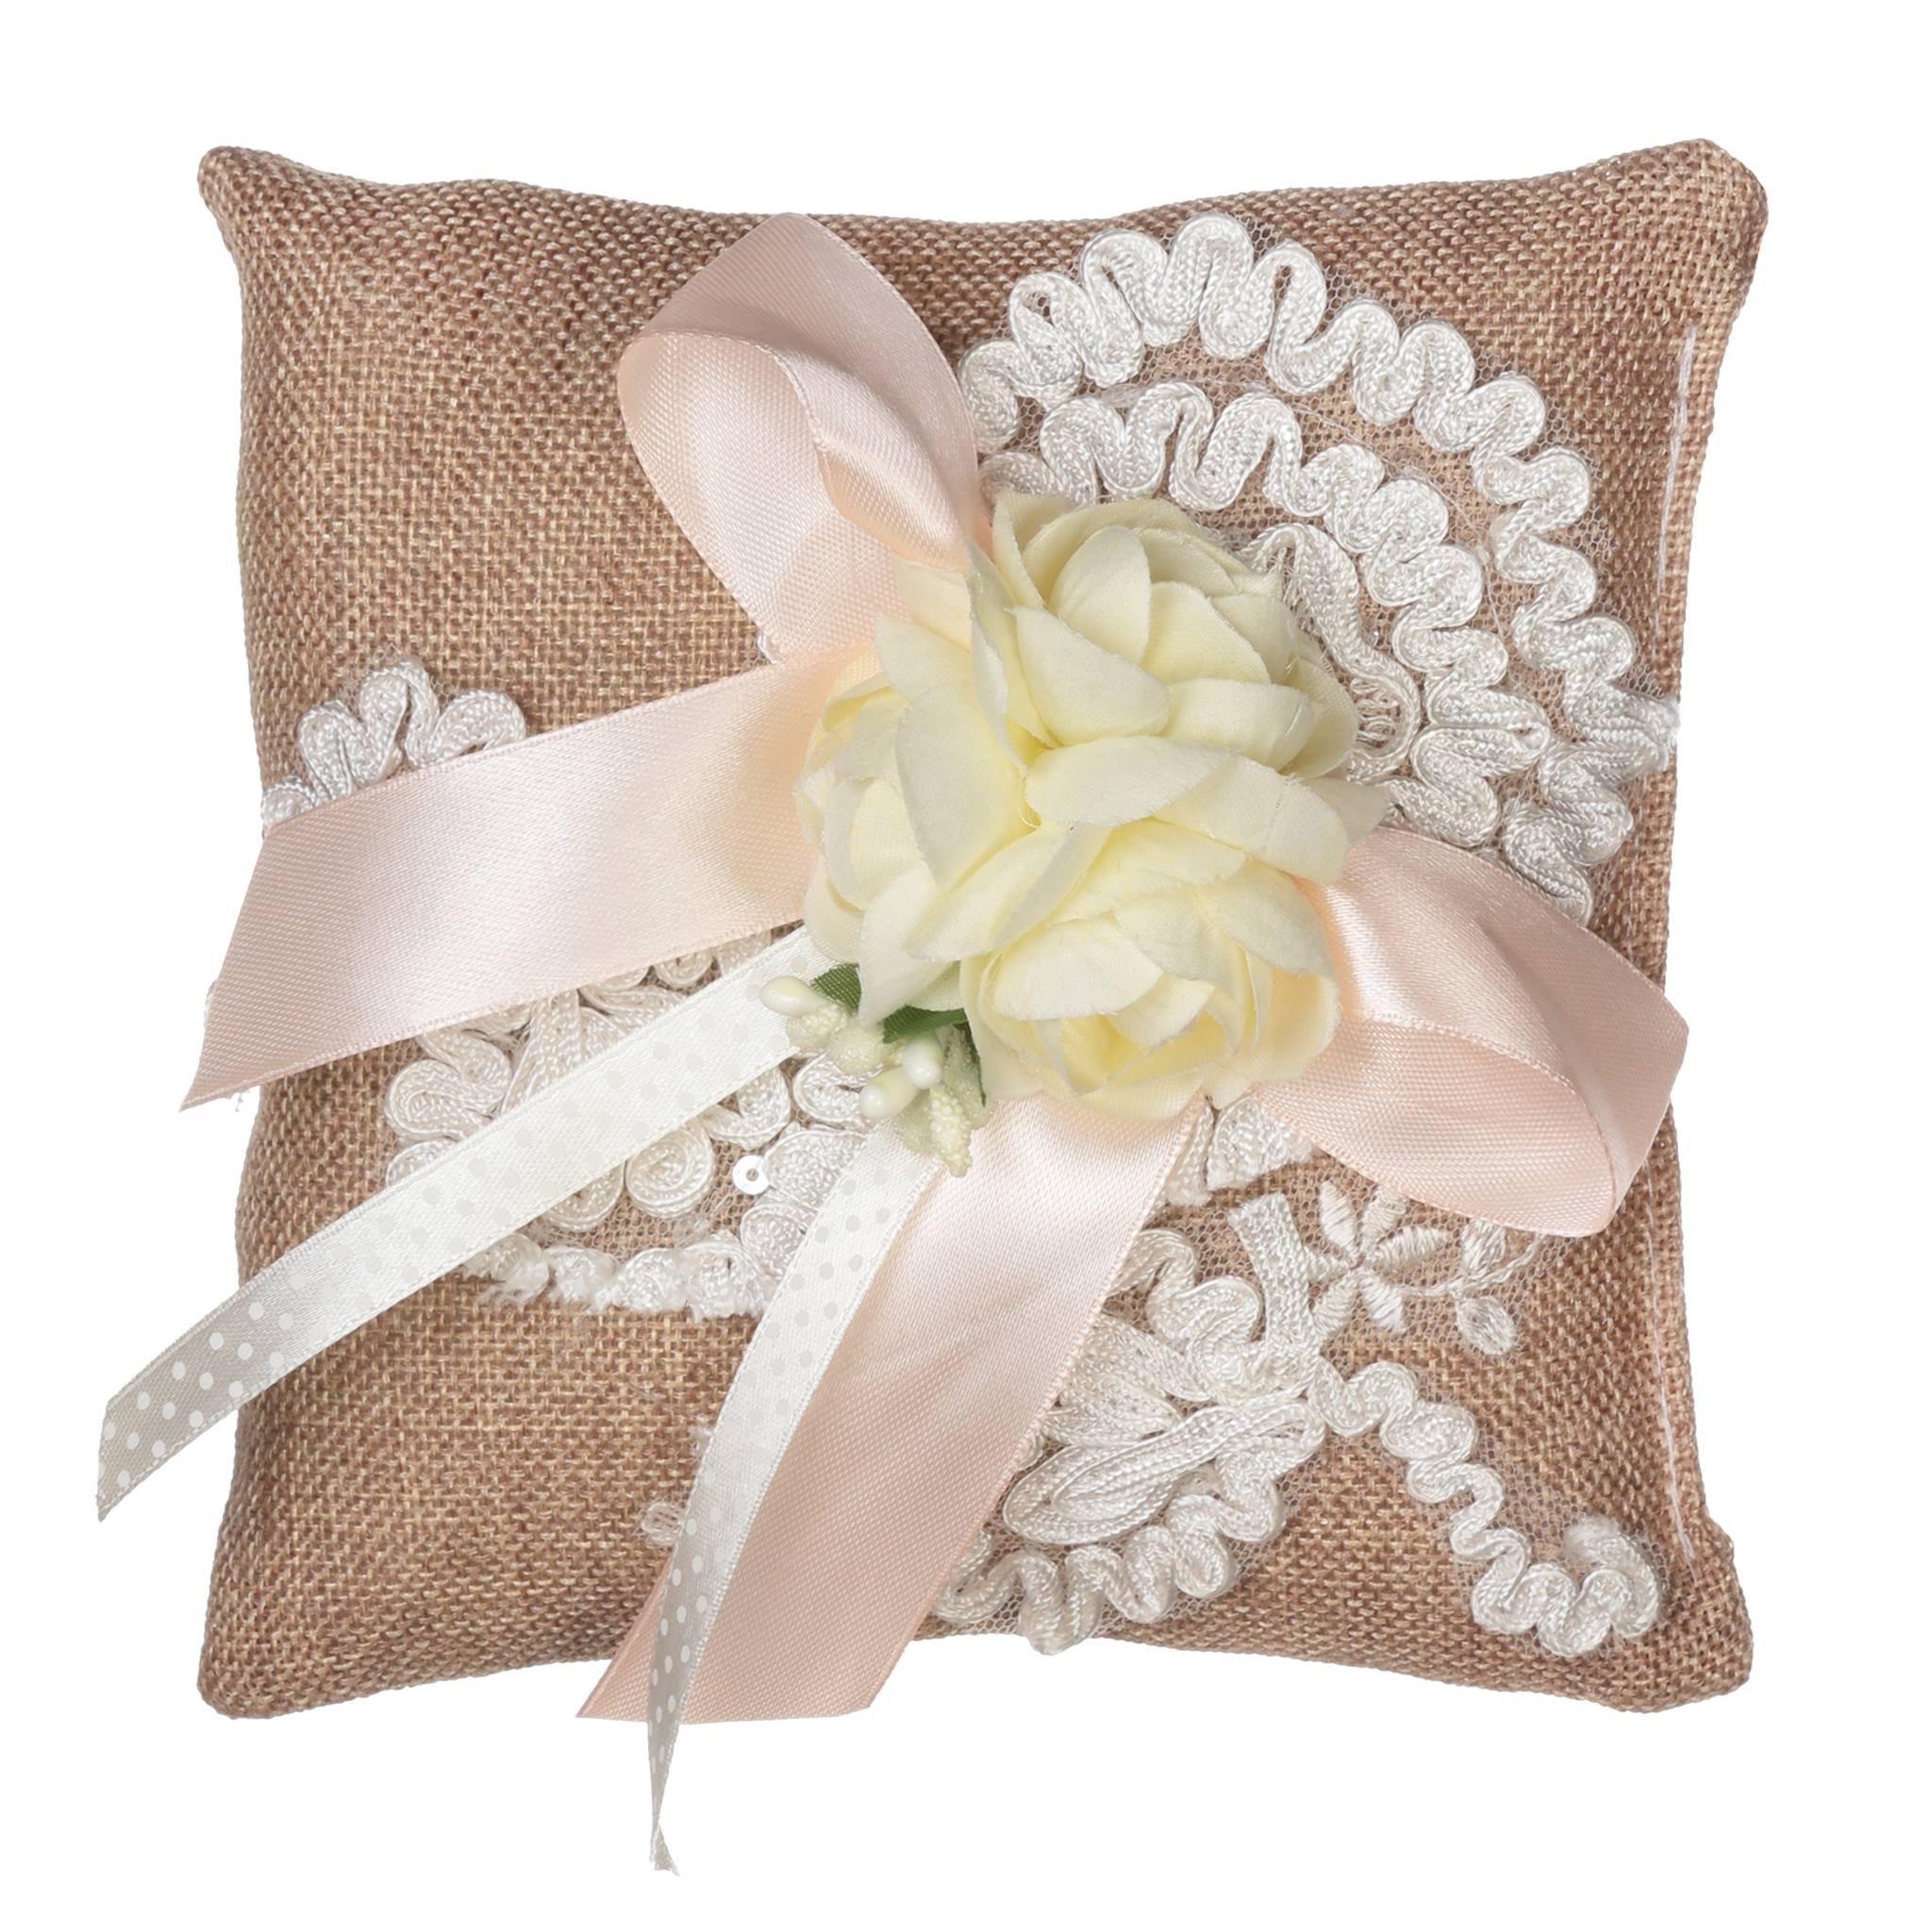 Buy romantic burlap rustic wedding ring pillow with flowers and lace romantic burlap rustic wedding ring pillow with flowers and lace izmirmasajfo